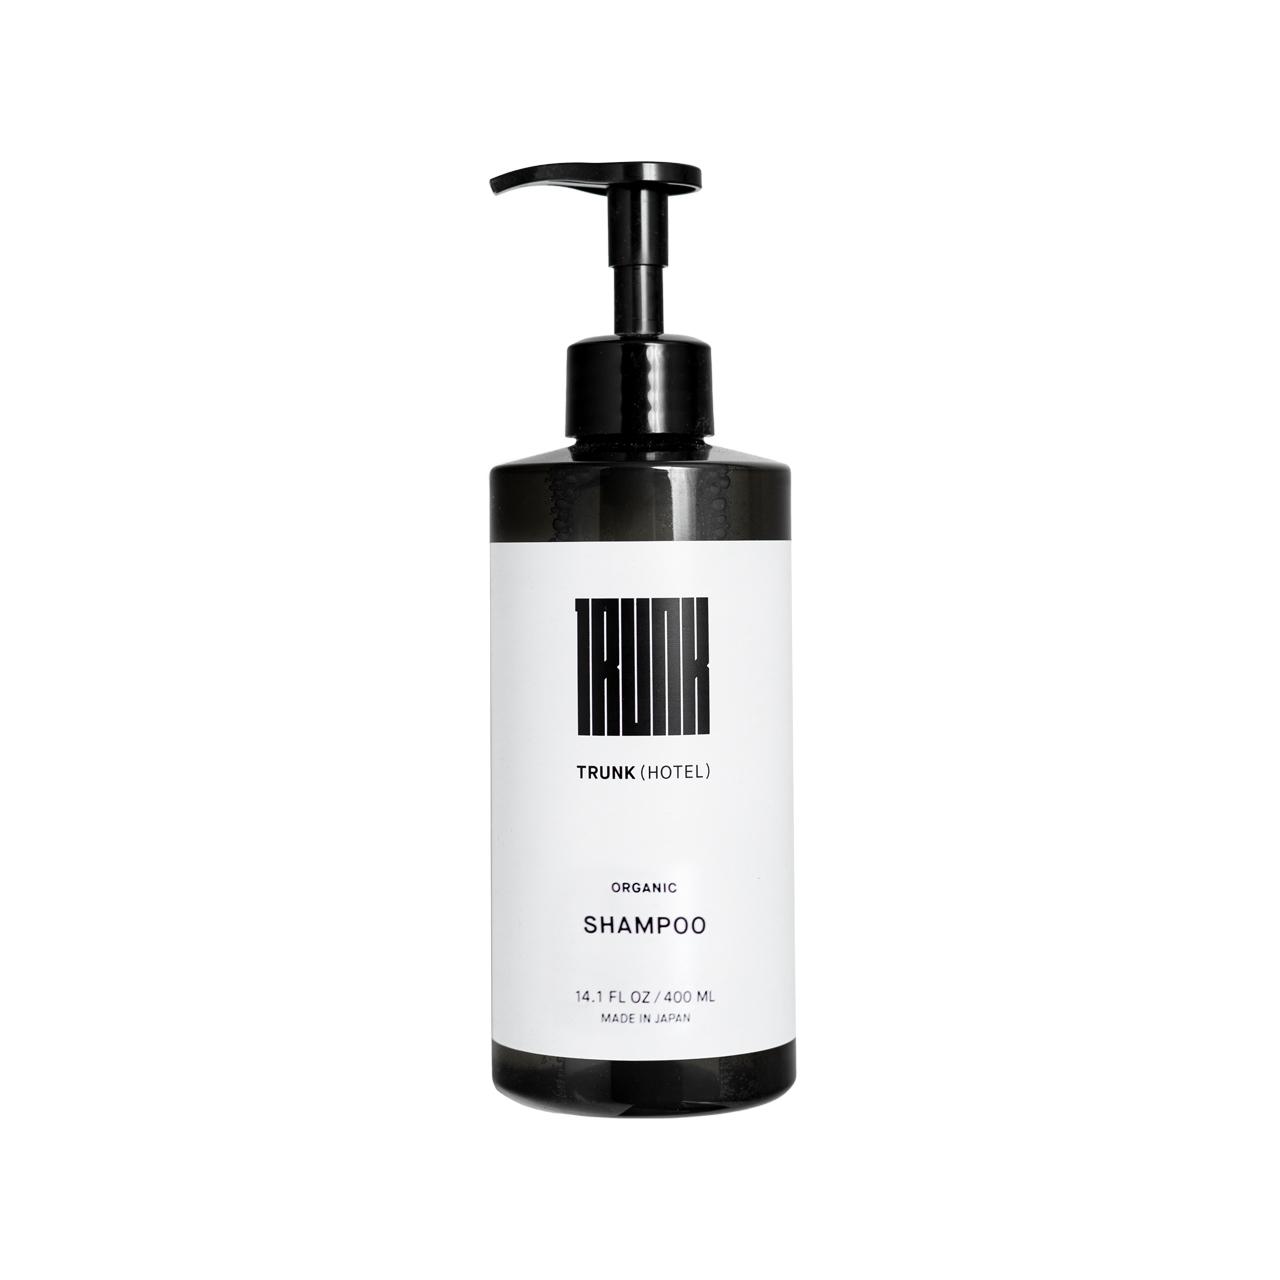 TRUNK Organic Shampoo